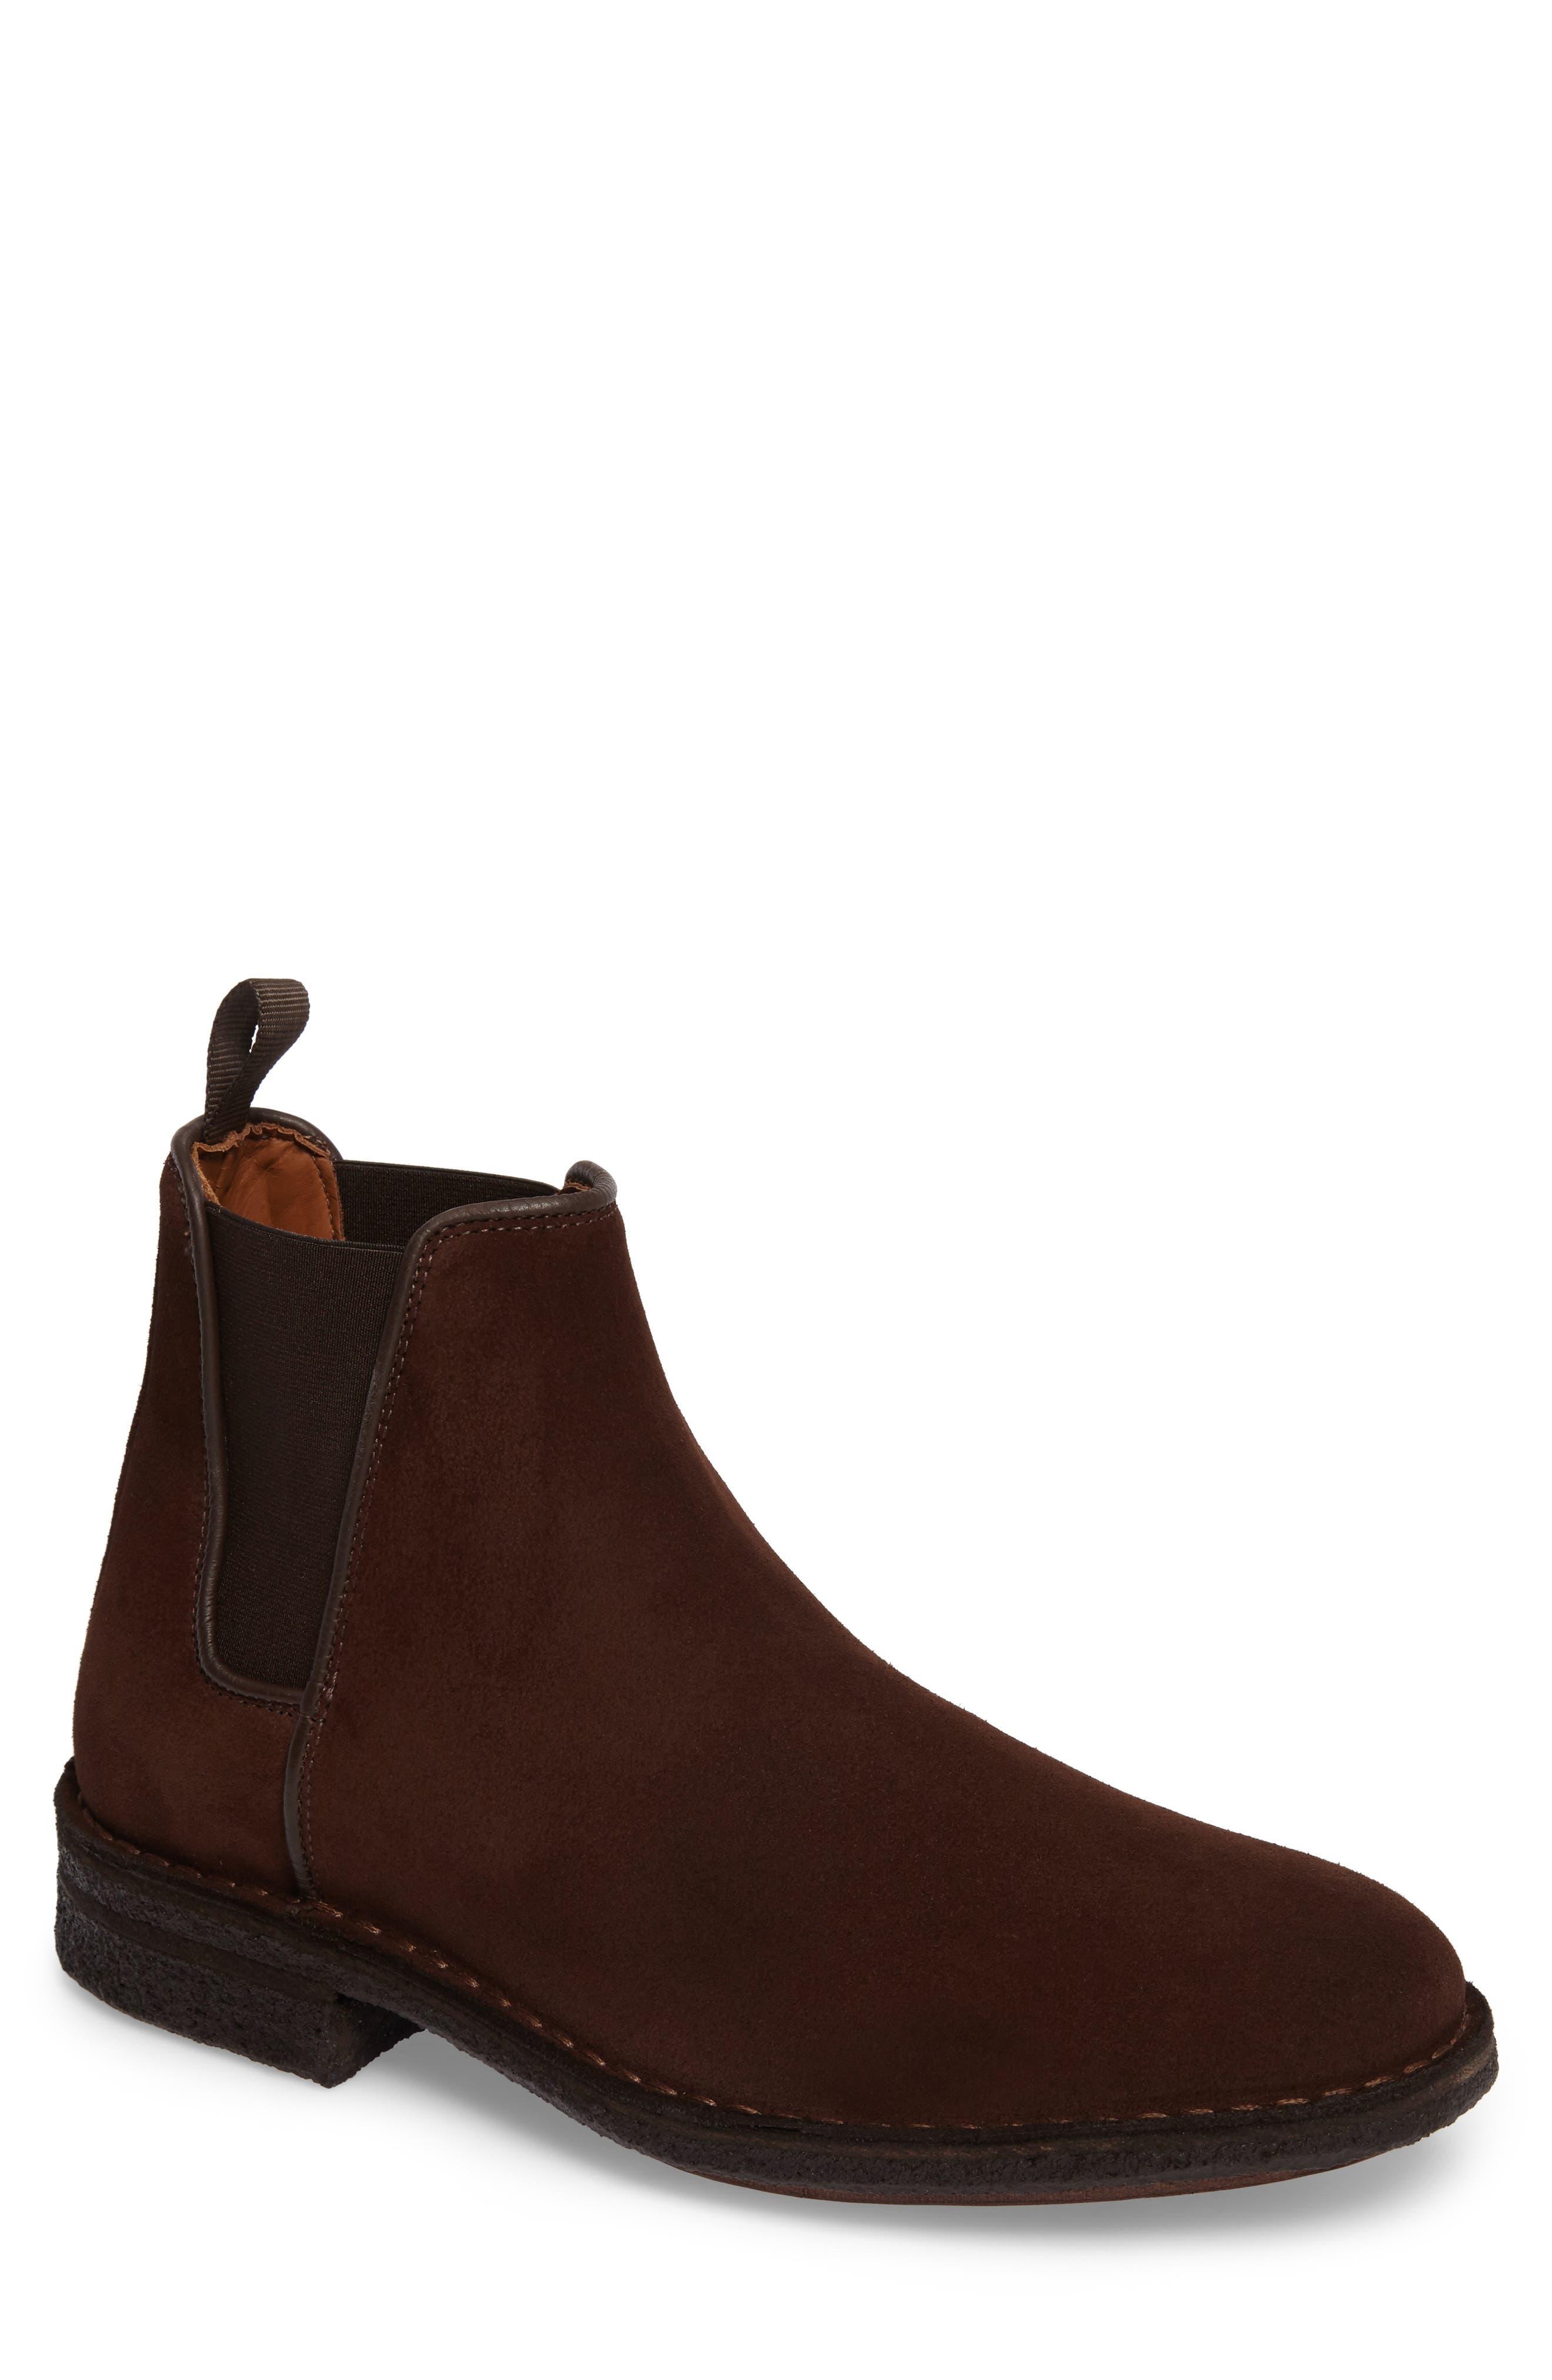 Oscar Chelsea Boot,                             Main thumbnail 1, color,                             Medium Brown